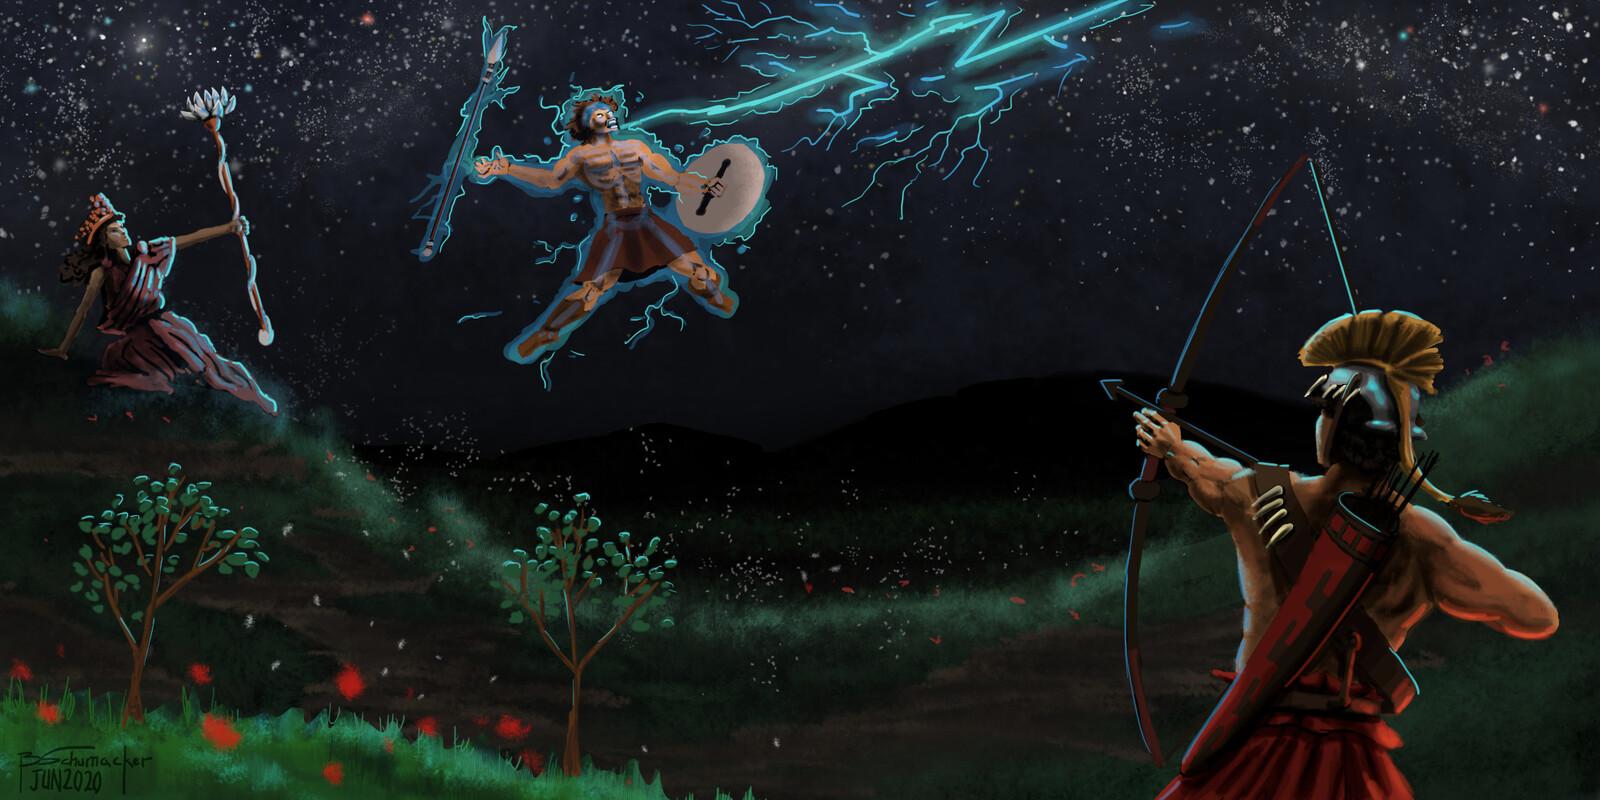 Porphyrion - King of the Gigantes